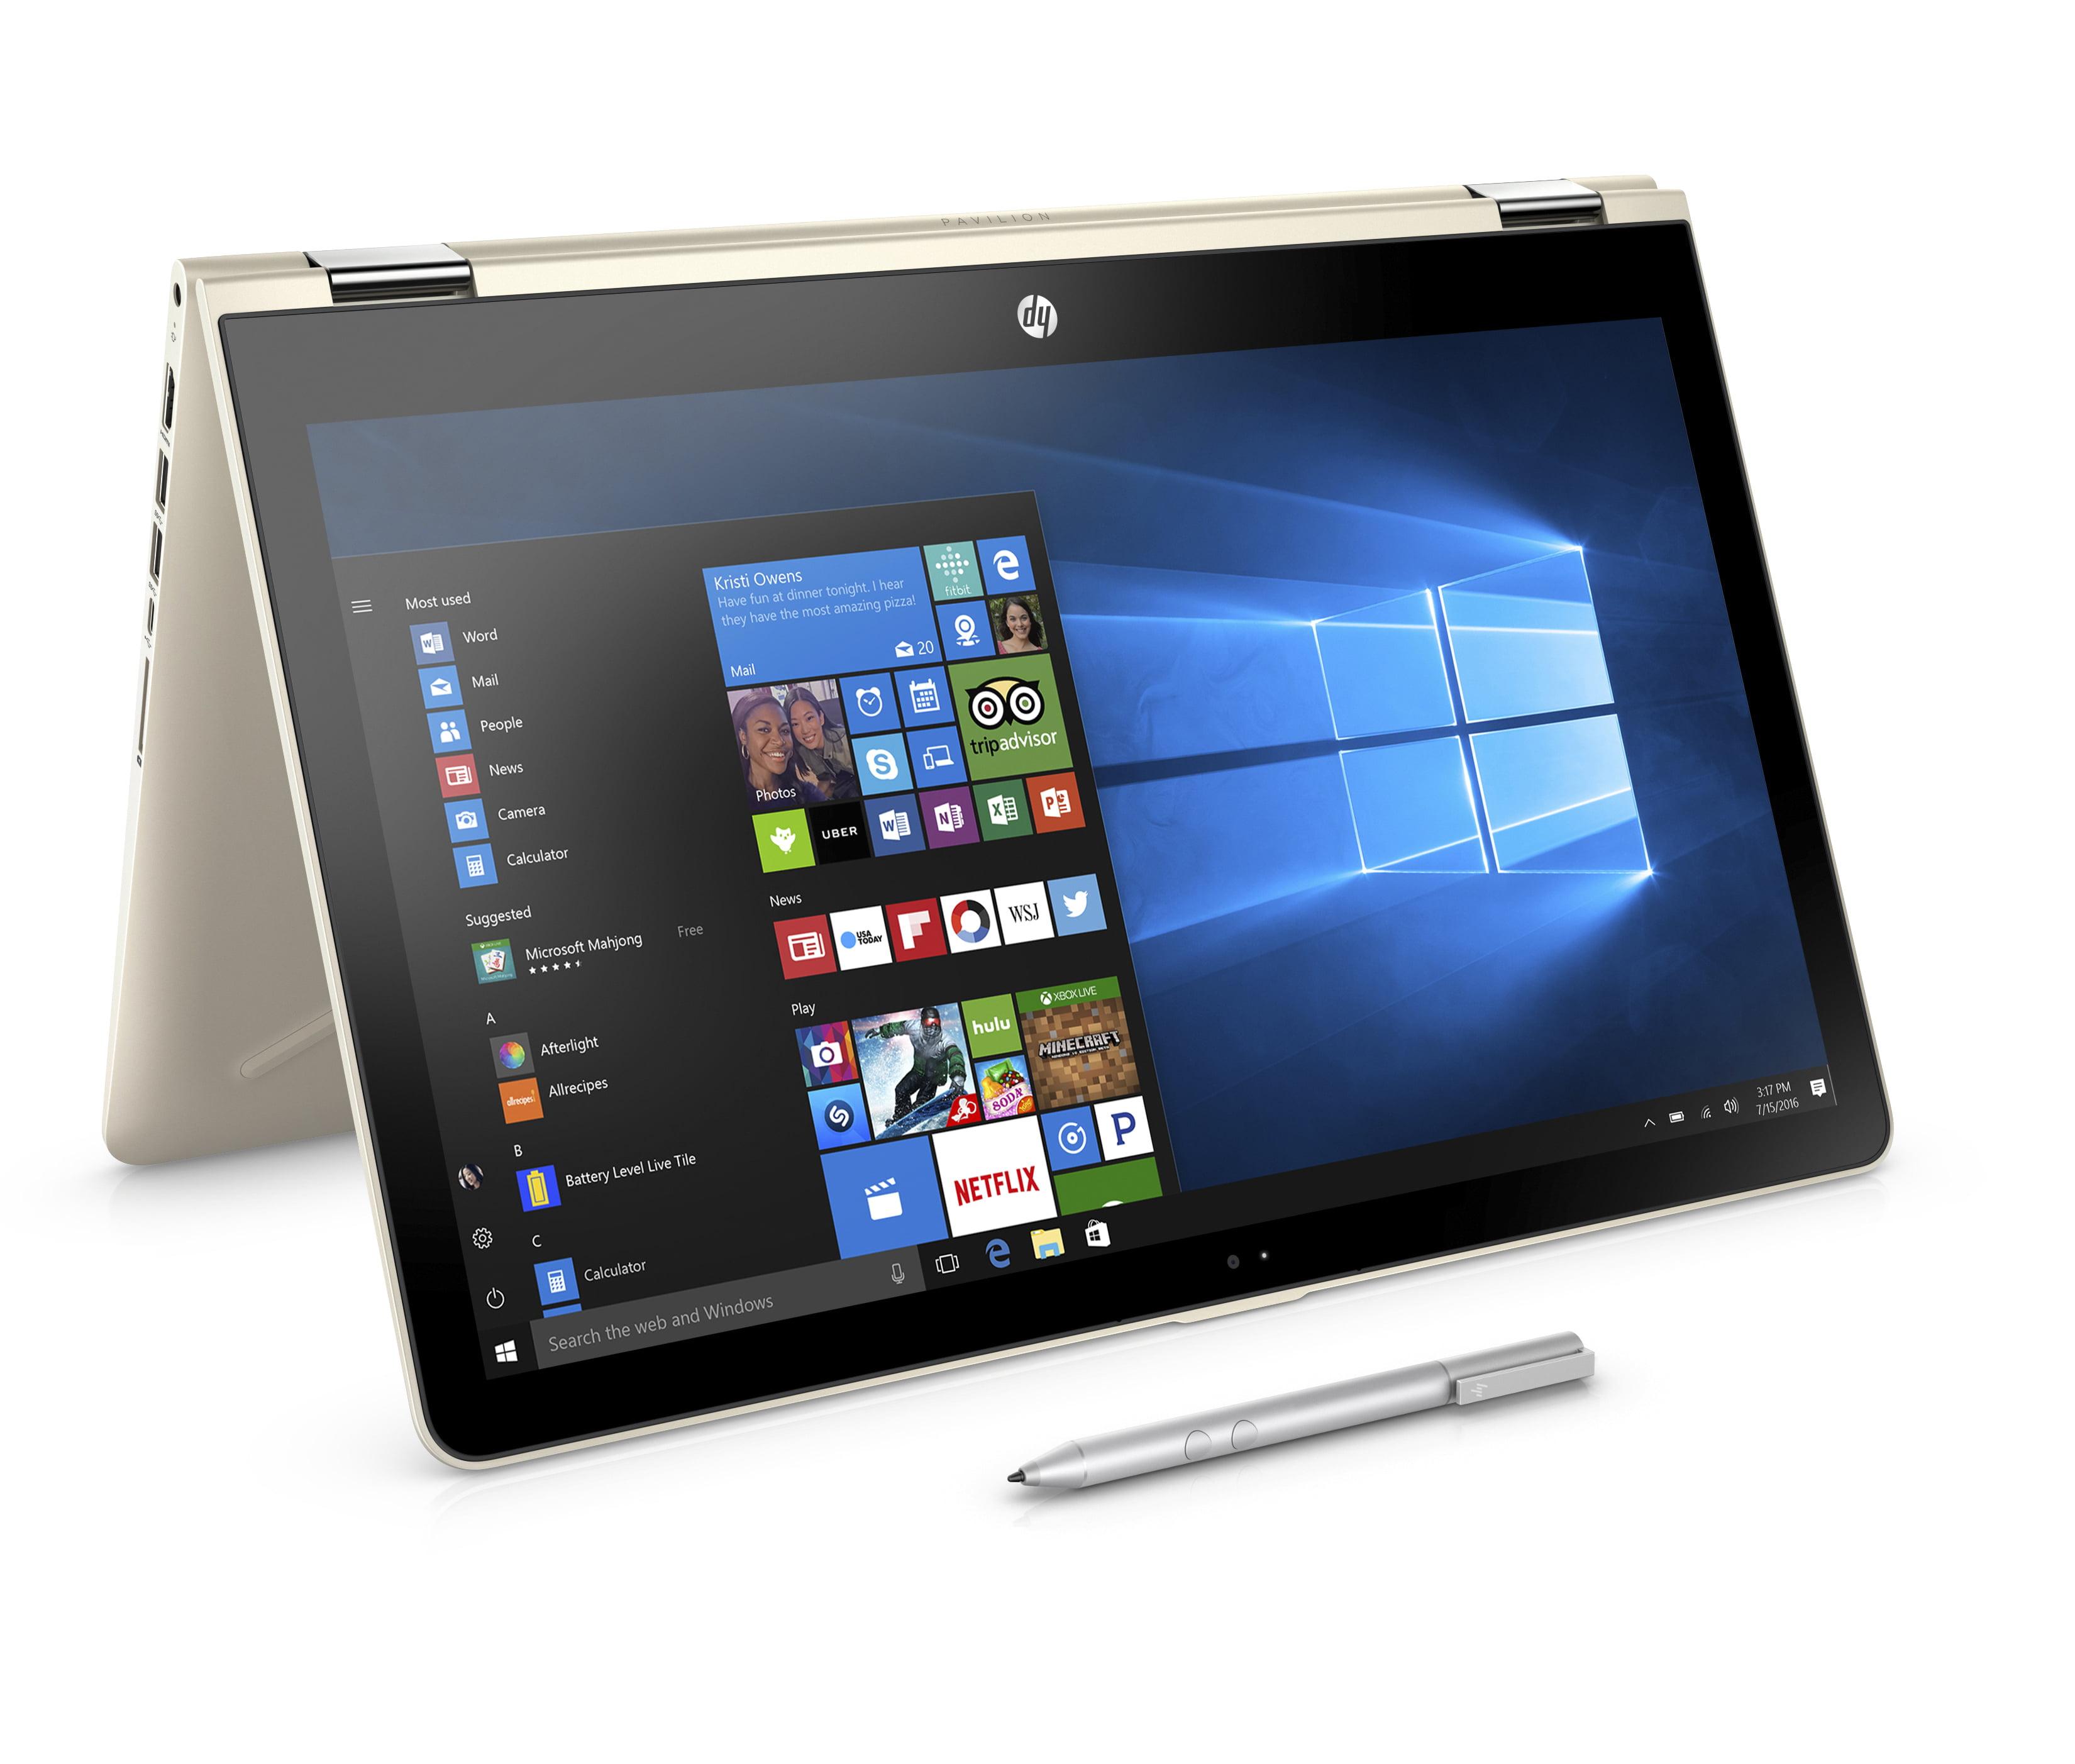 "HP Pavilion 15-br082wm X360 15.6"" Touchscreen 2 in 1 Laptop, Windows 10, Intel Corei5-7200U Processor,... by HP"